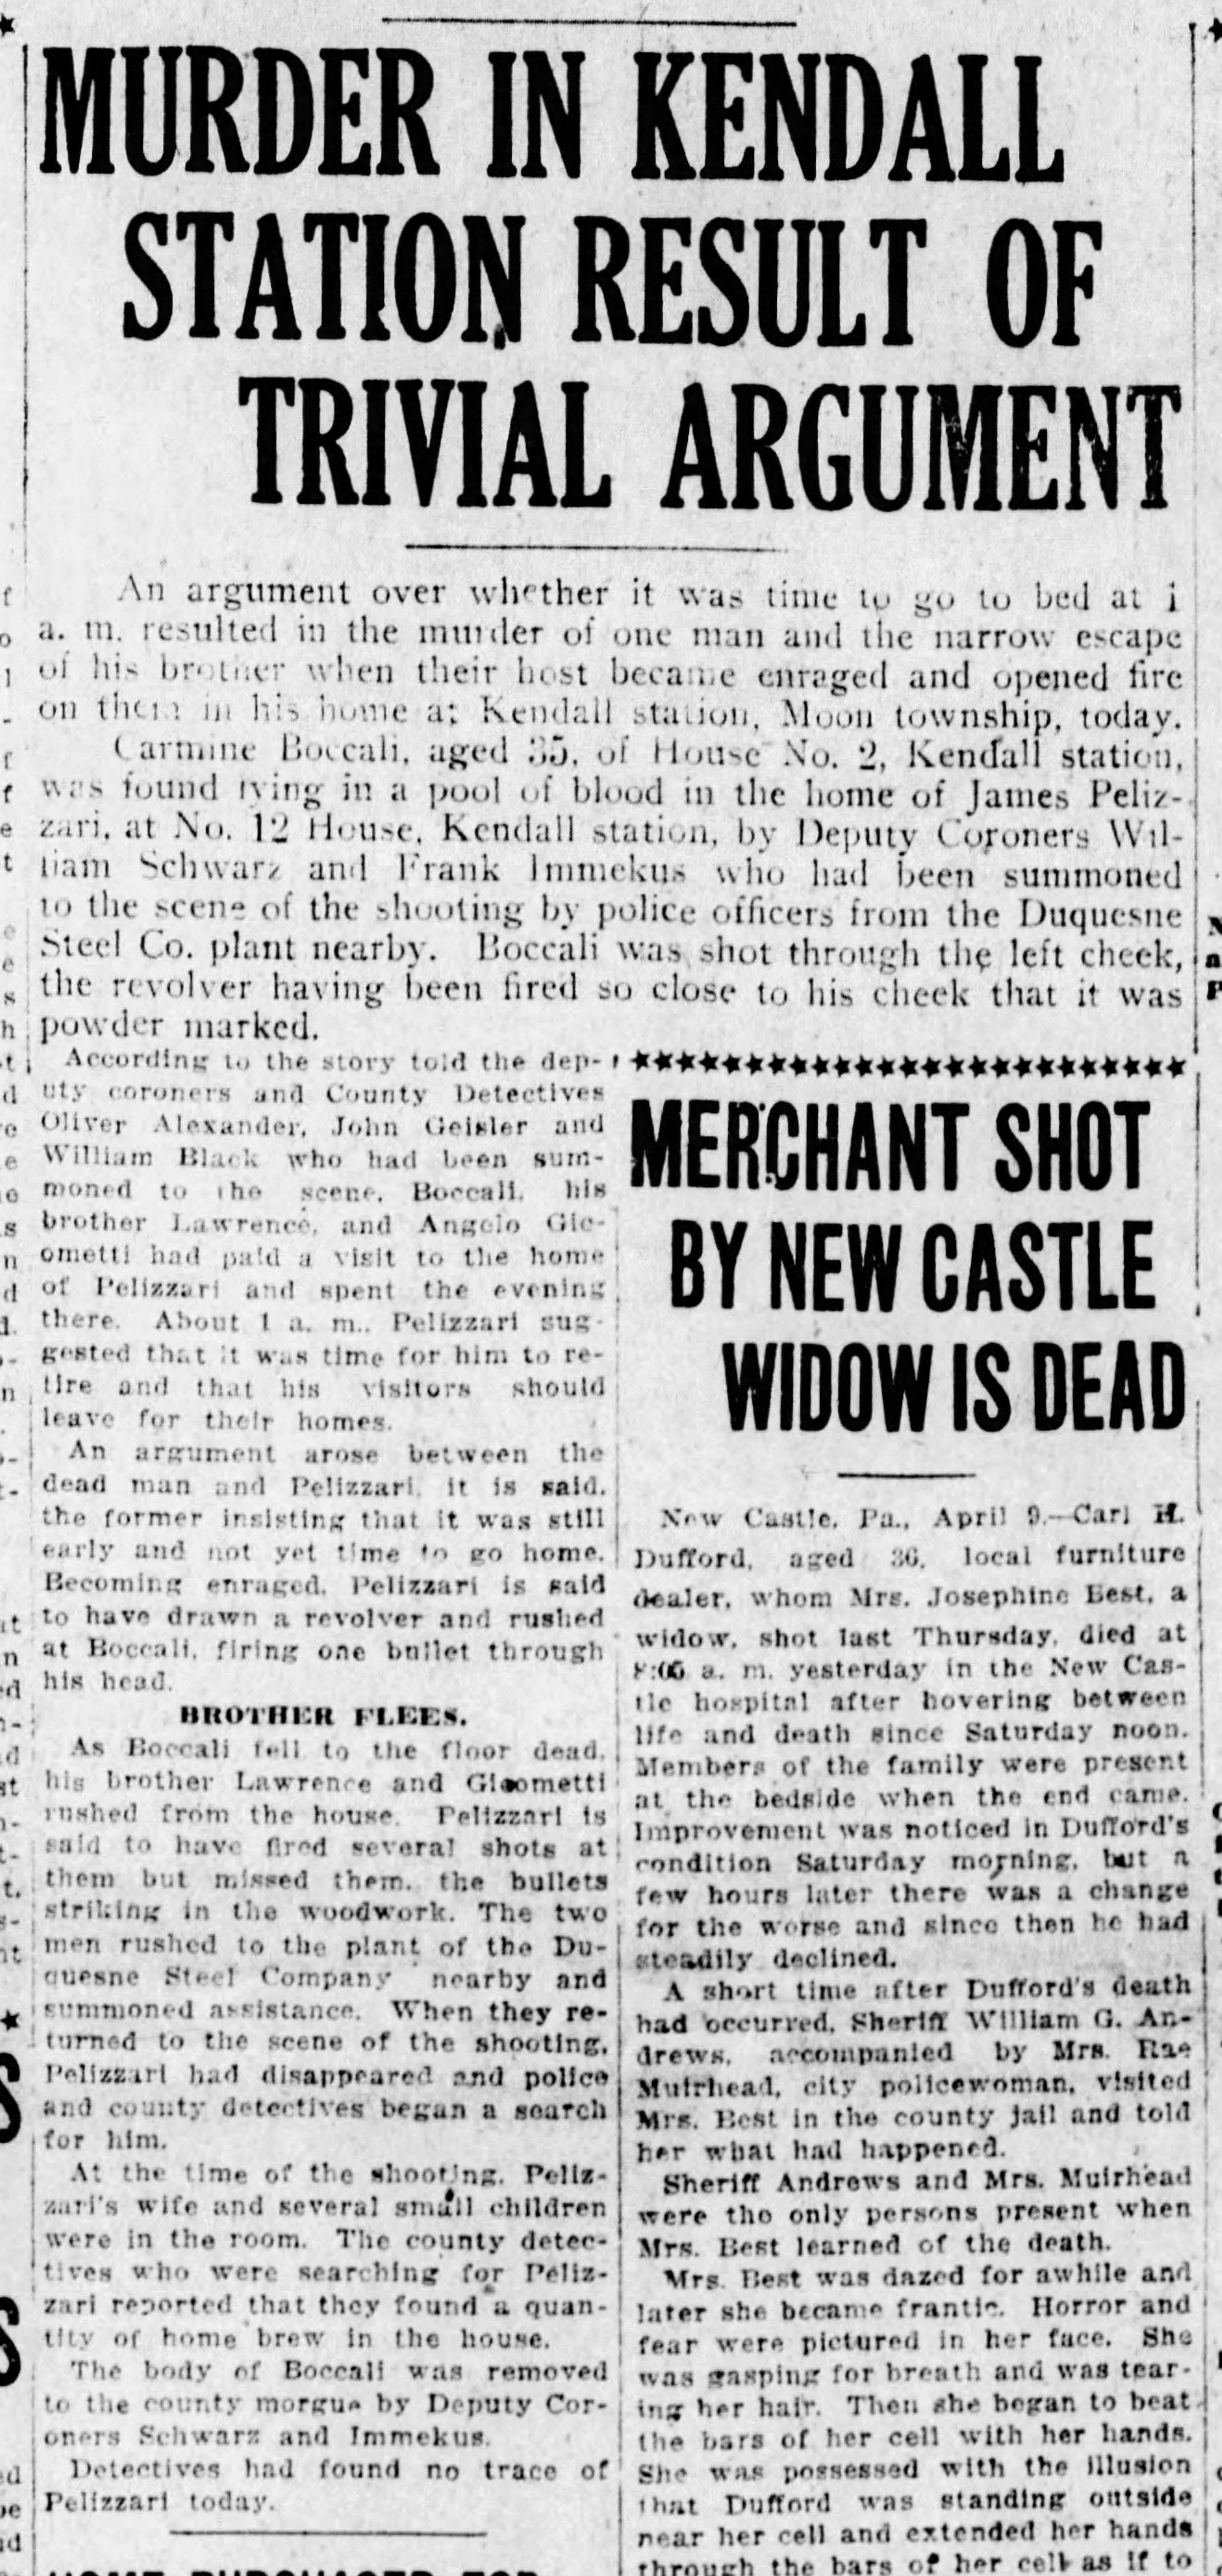 The Pittsburgh Press, April 9, 1923